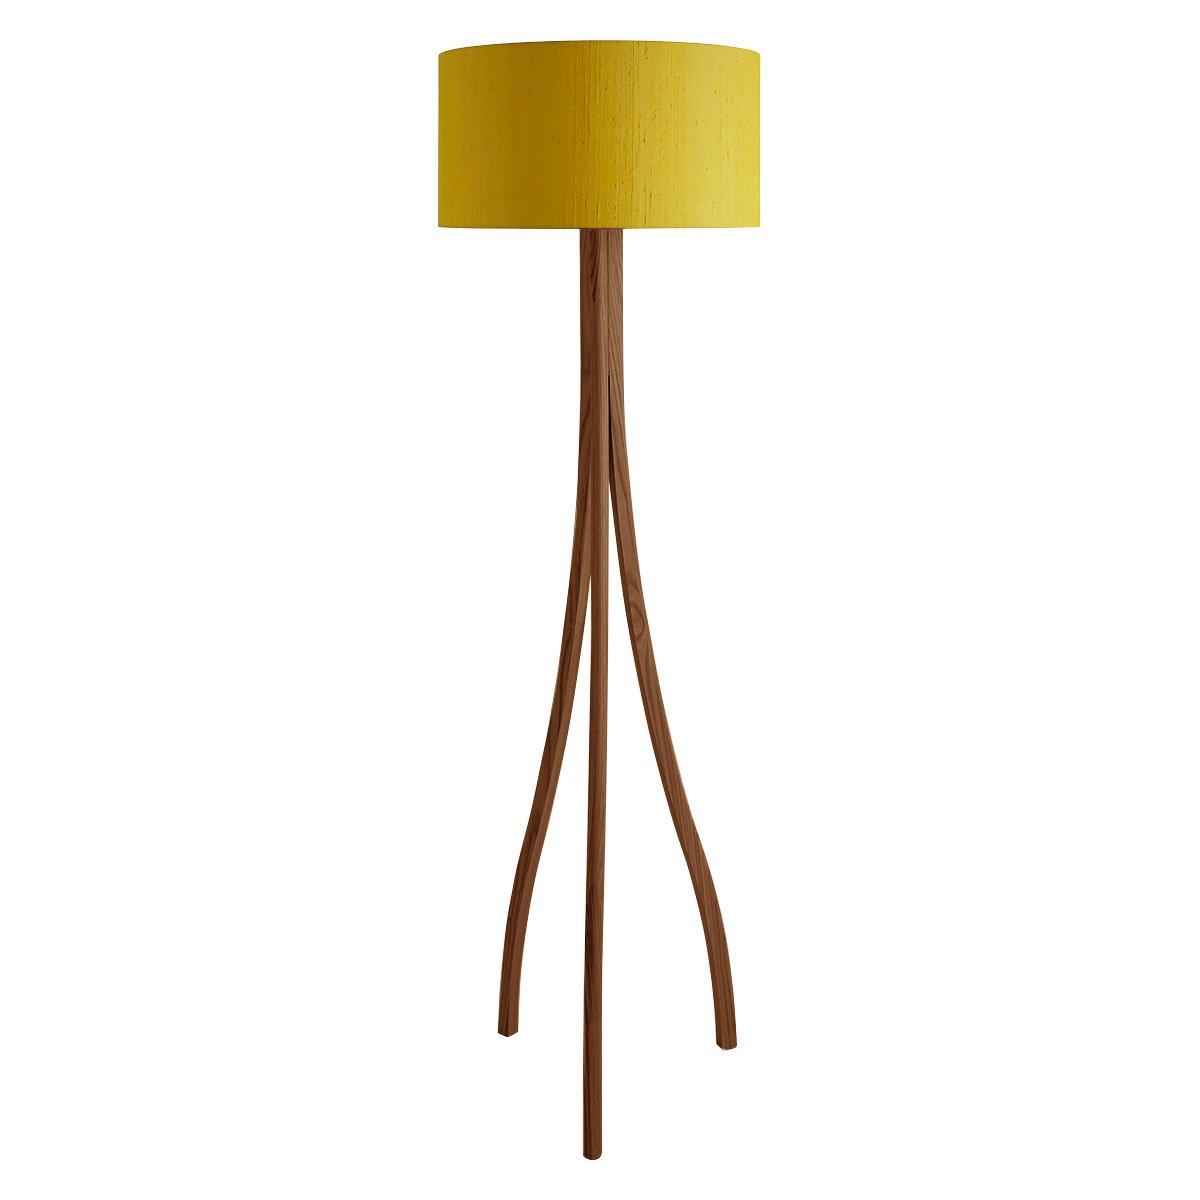 image-Harmony Walnut Stained Wooden Floor Lamp With Yellow Silk Shade, Walnut/Yellow